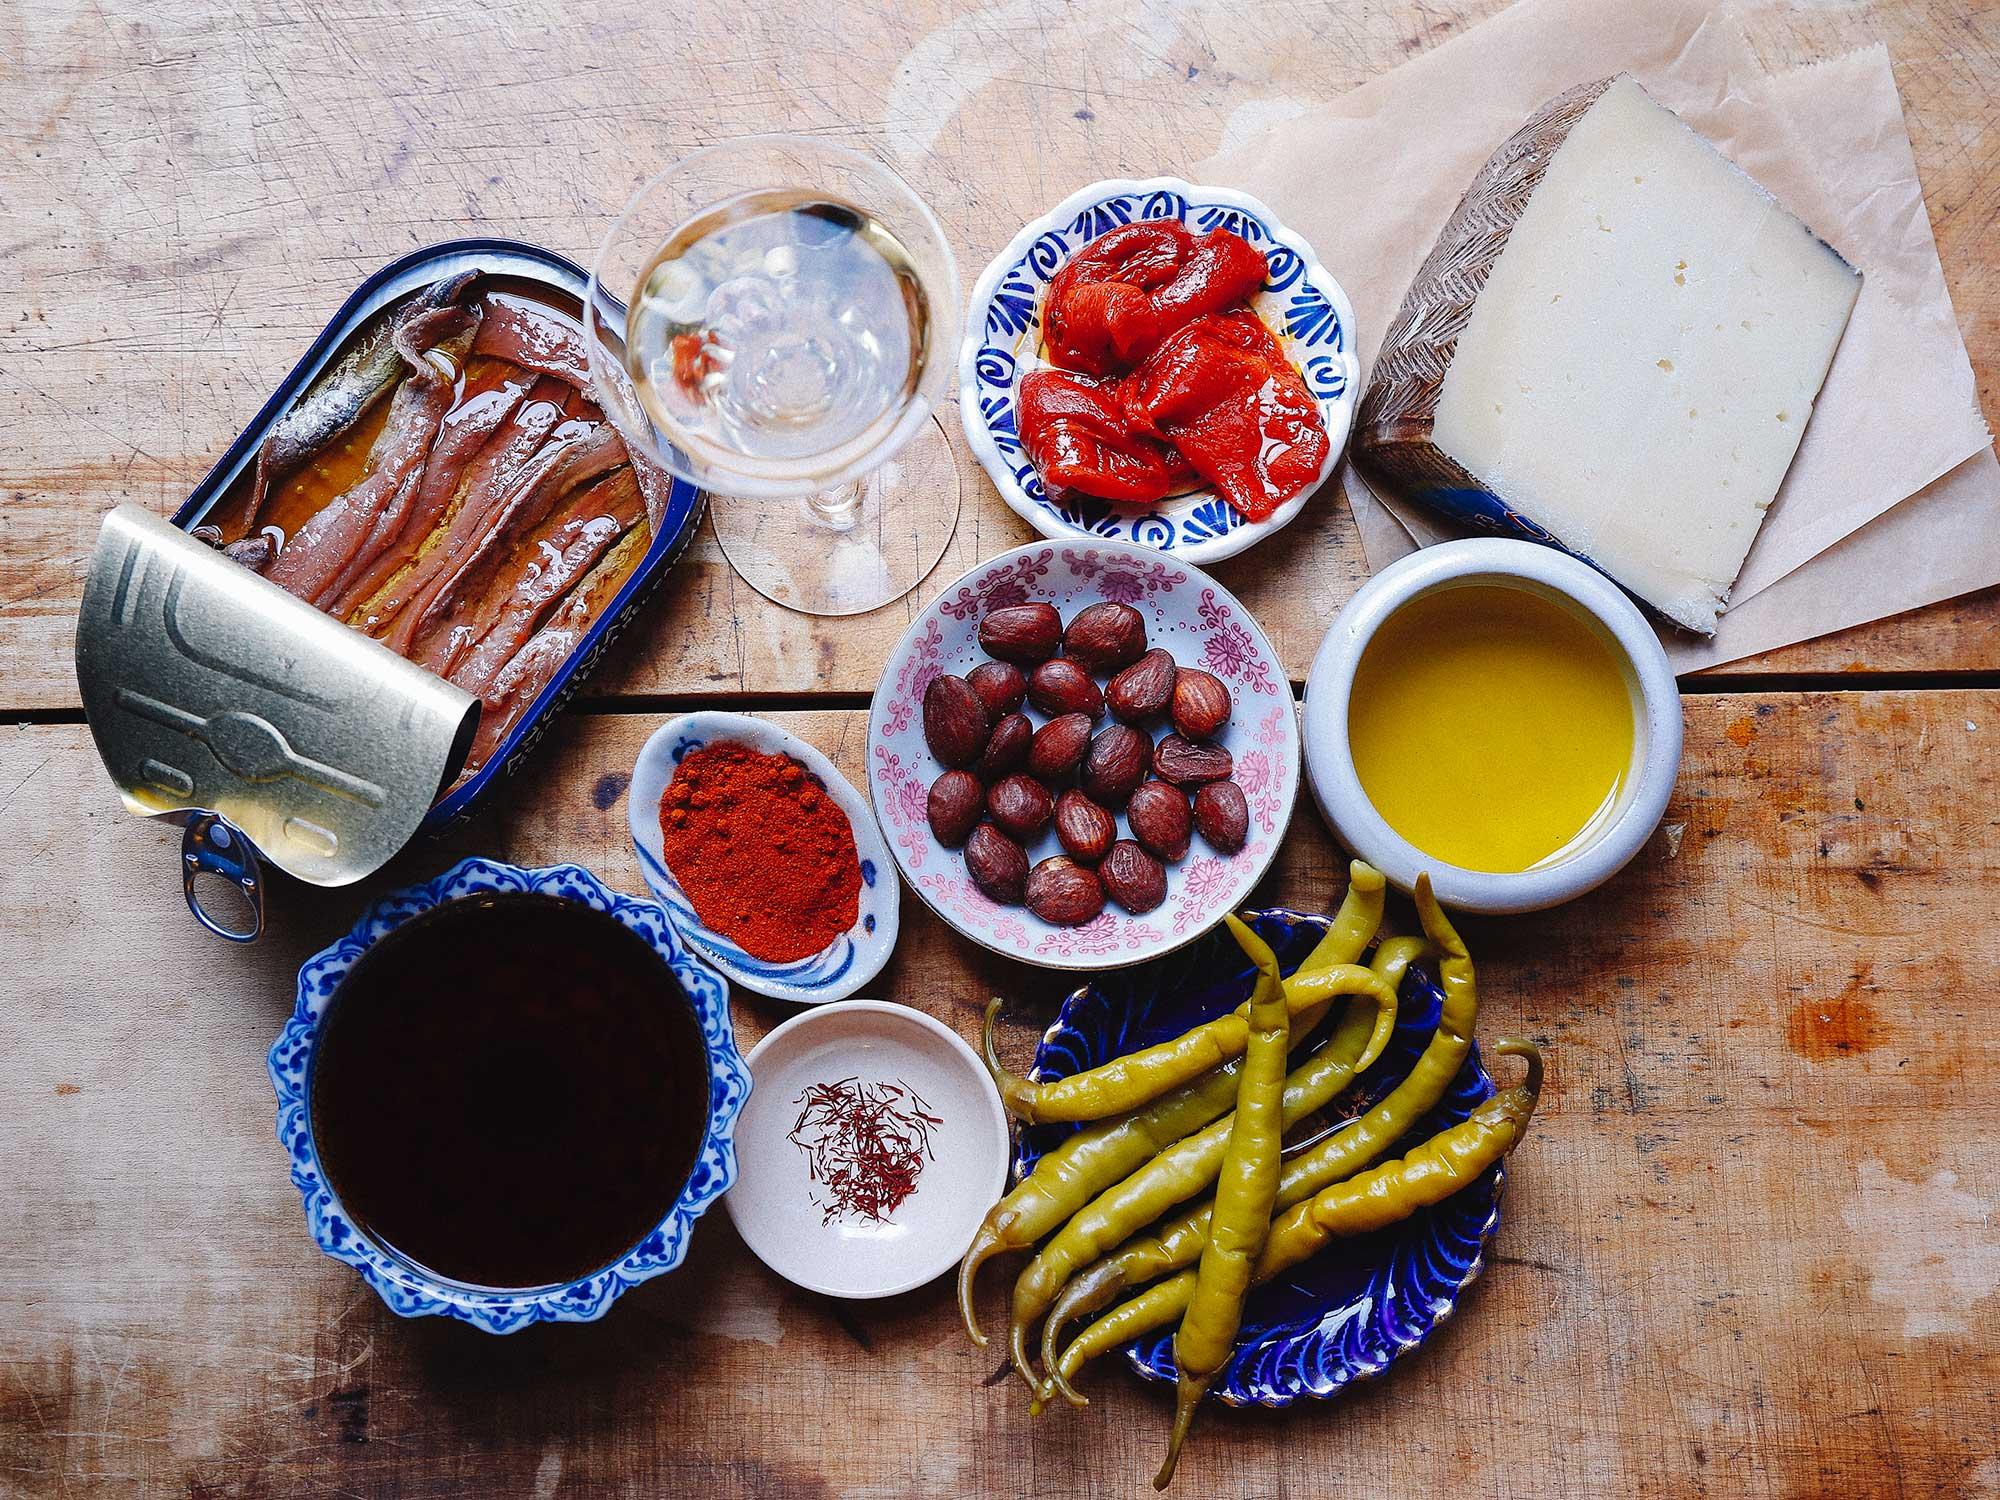 Traditional Spanish ingredients